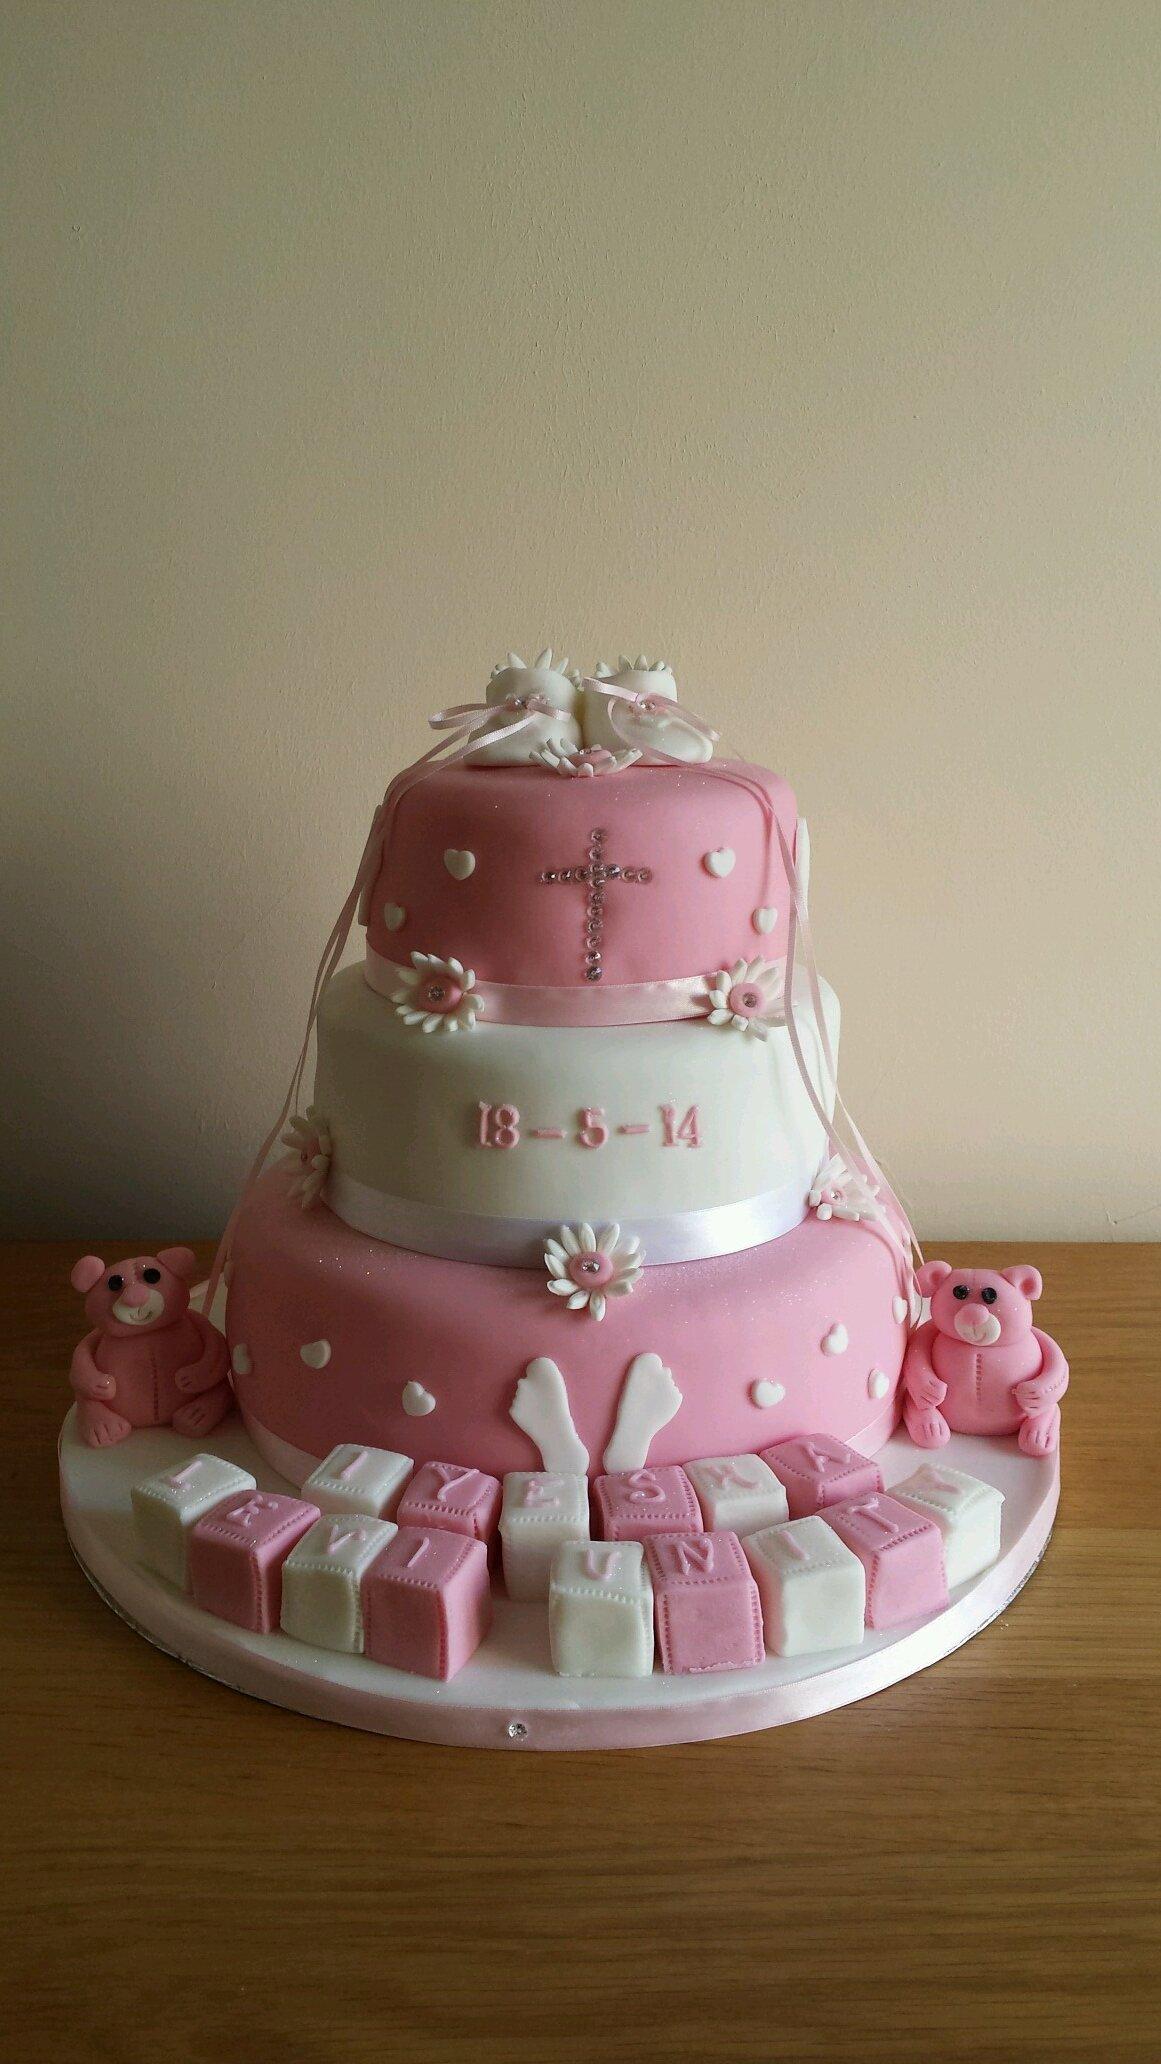 cakes by karen (@cakesbykaz)